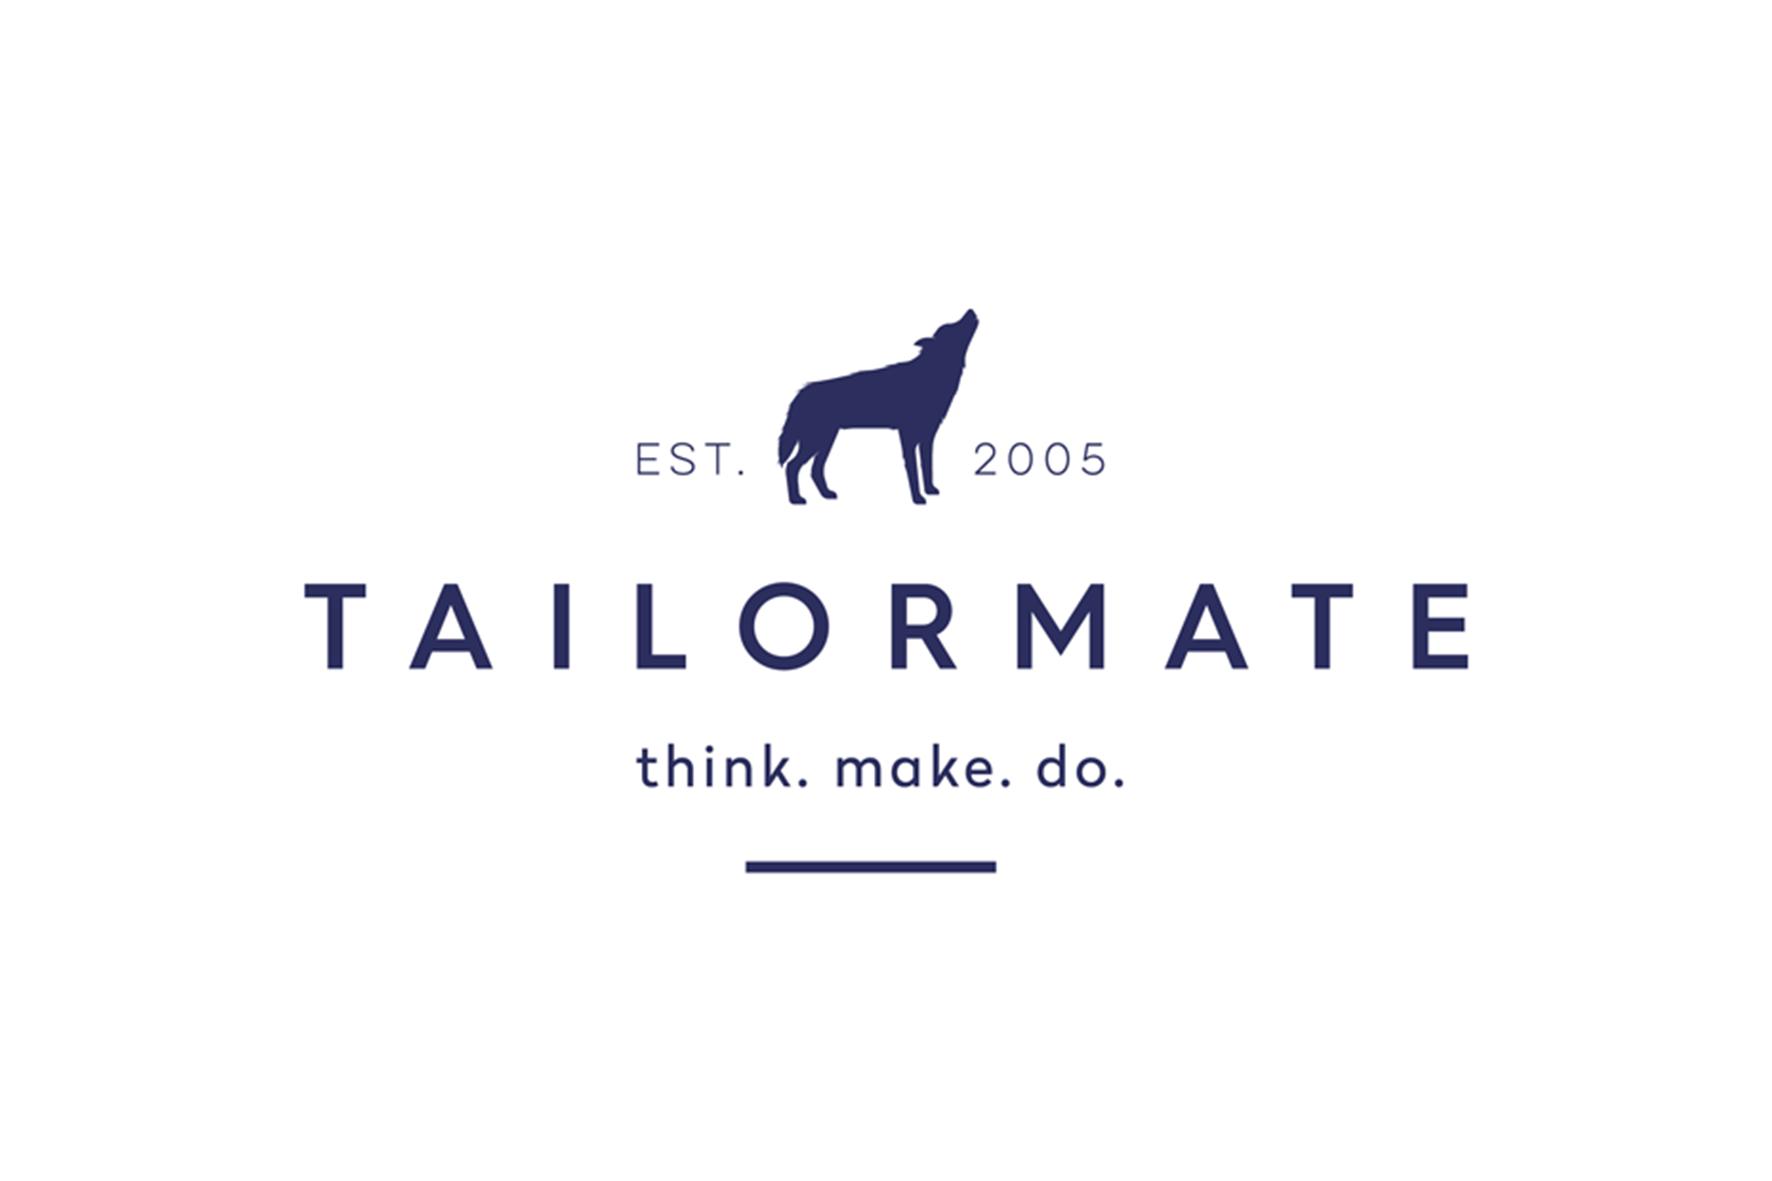 Tailormate